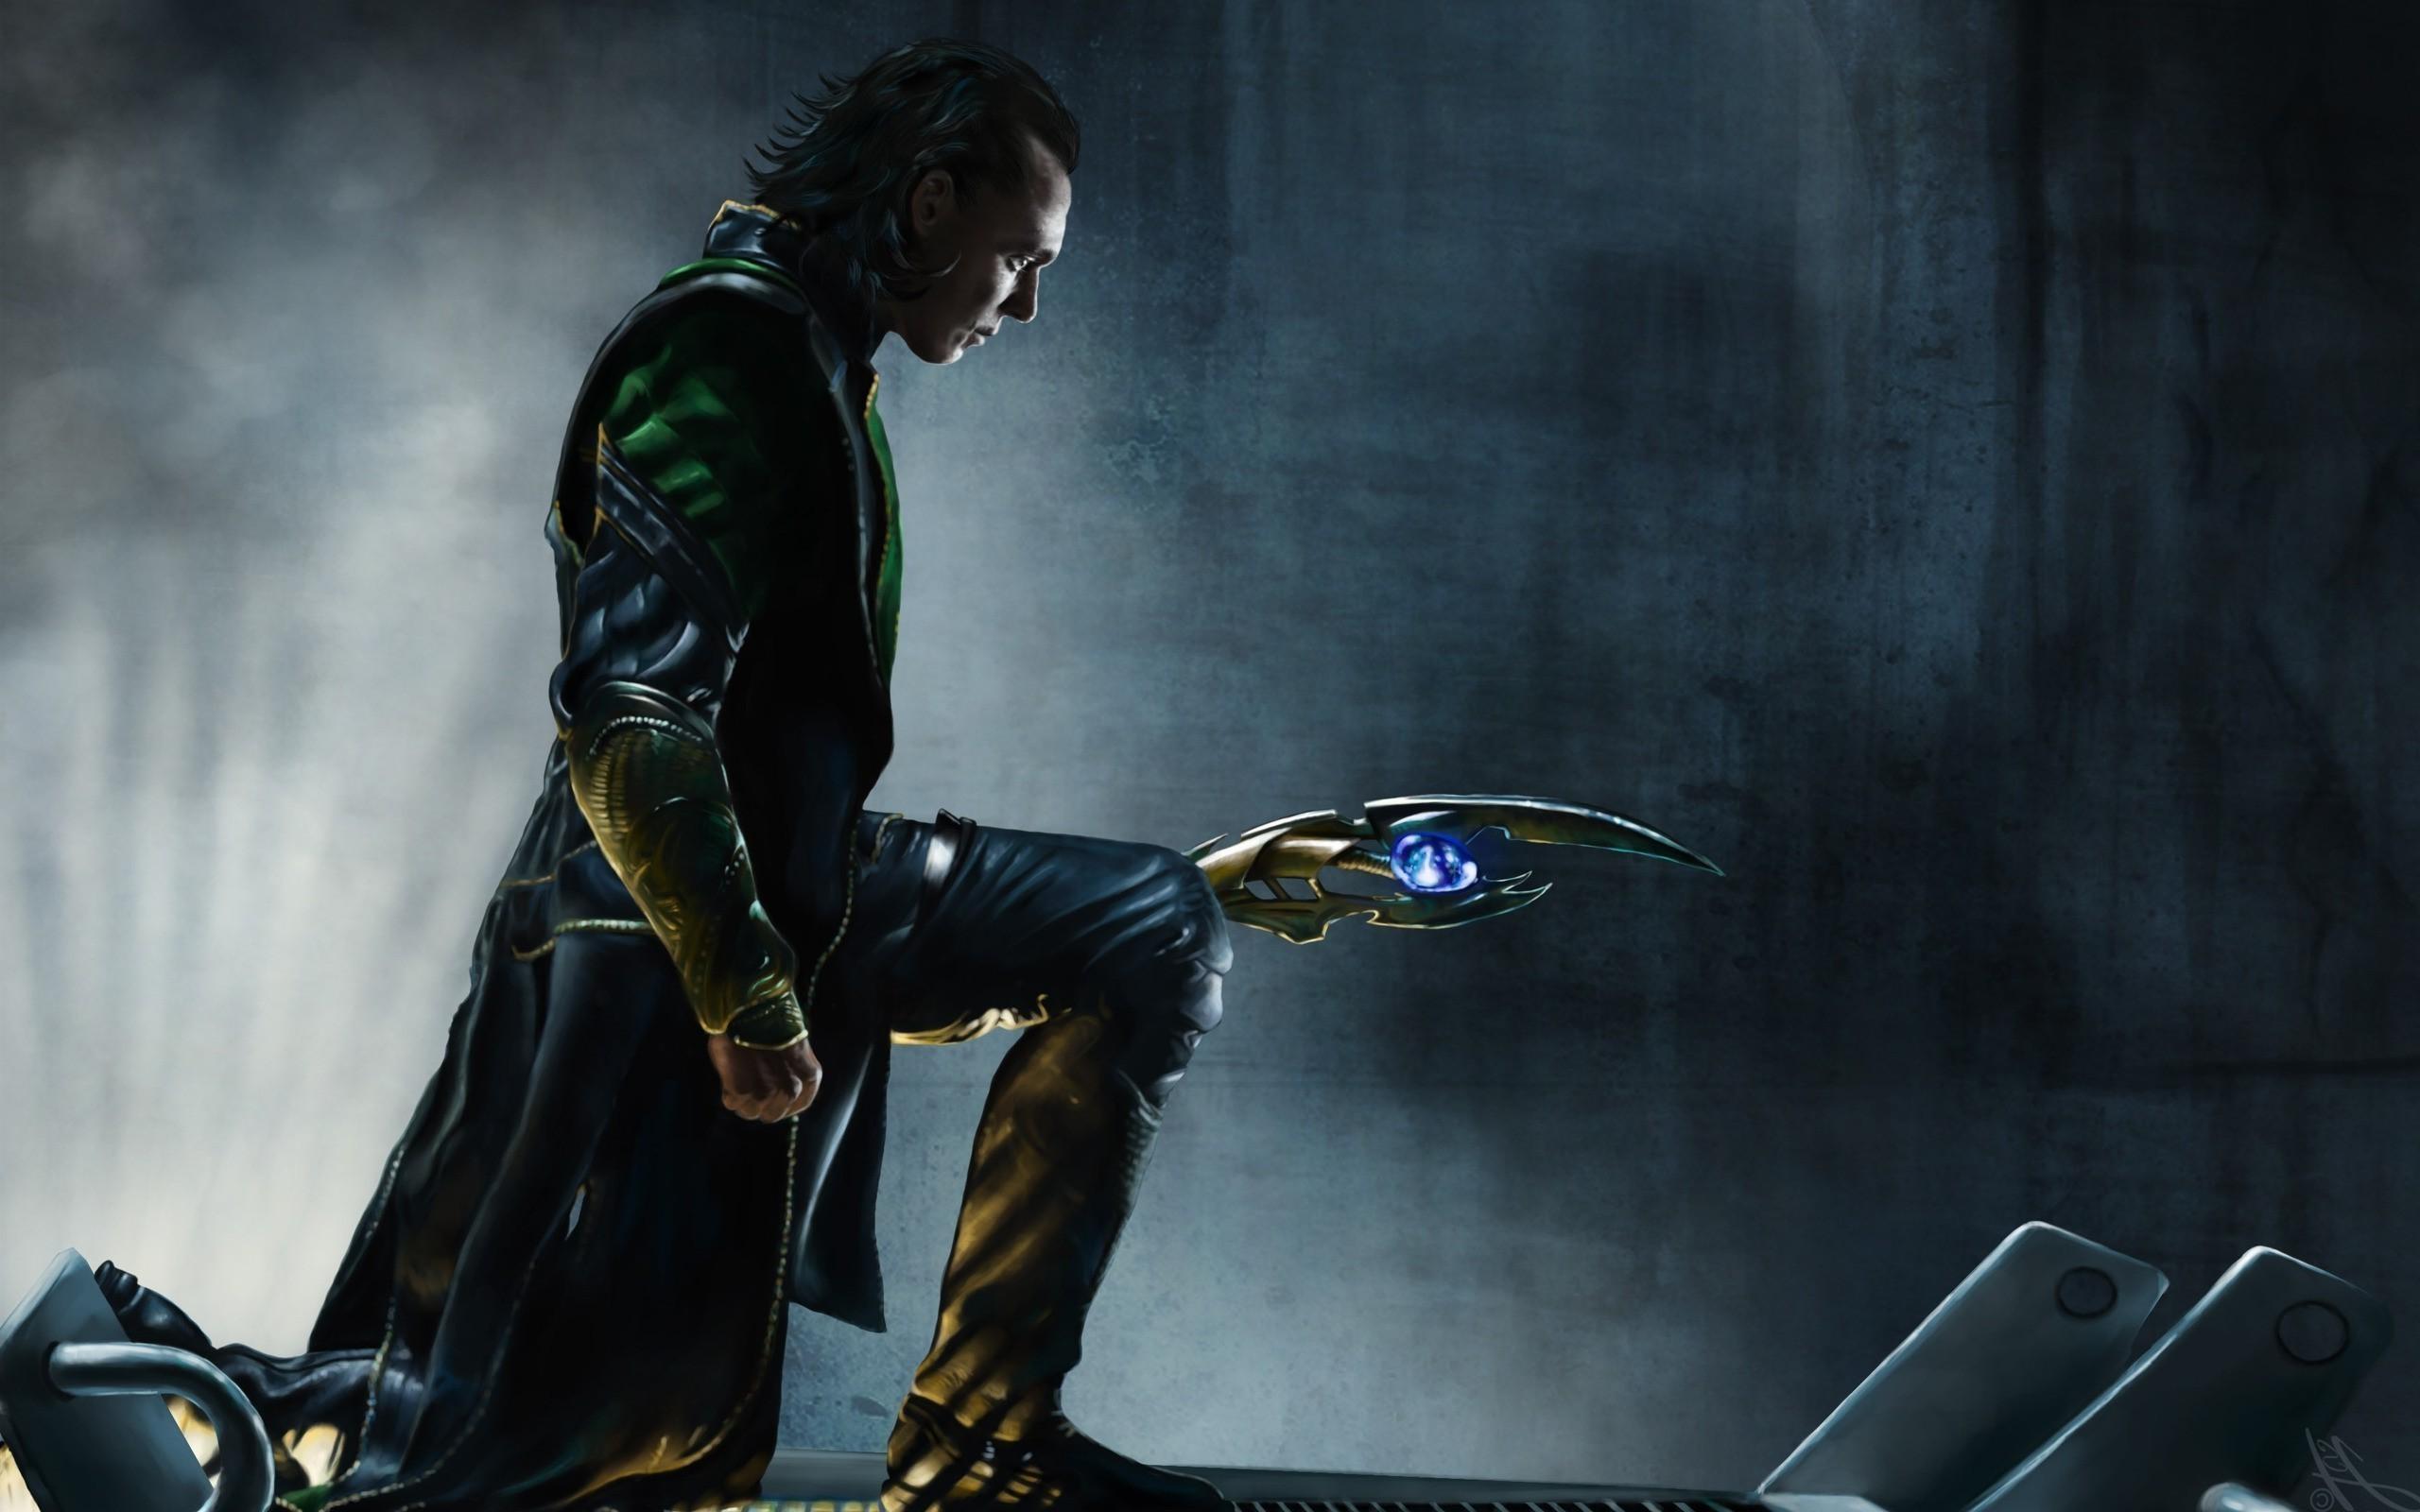 Loki wallpaper 15667 2560x1600